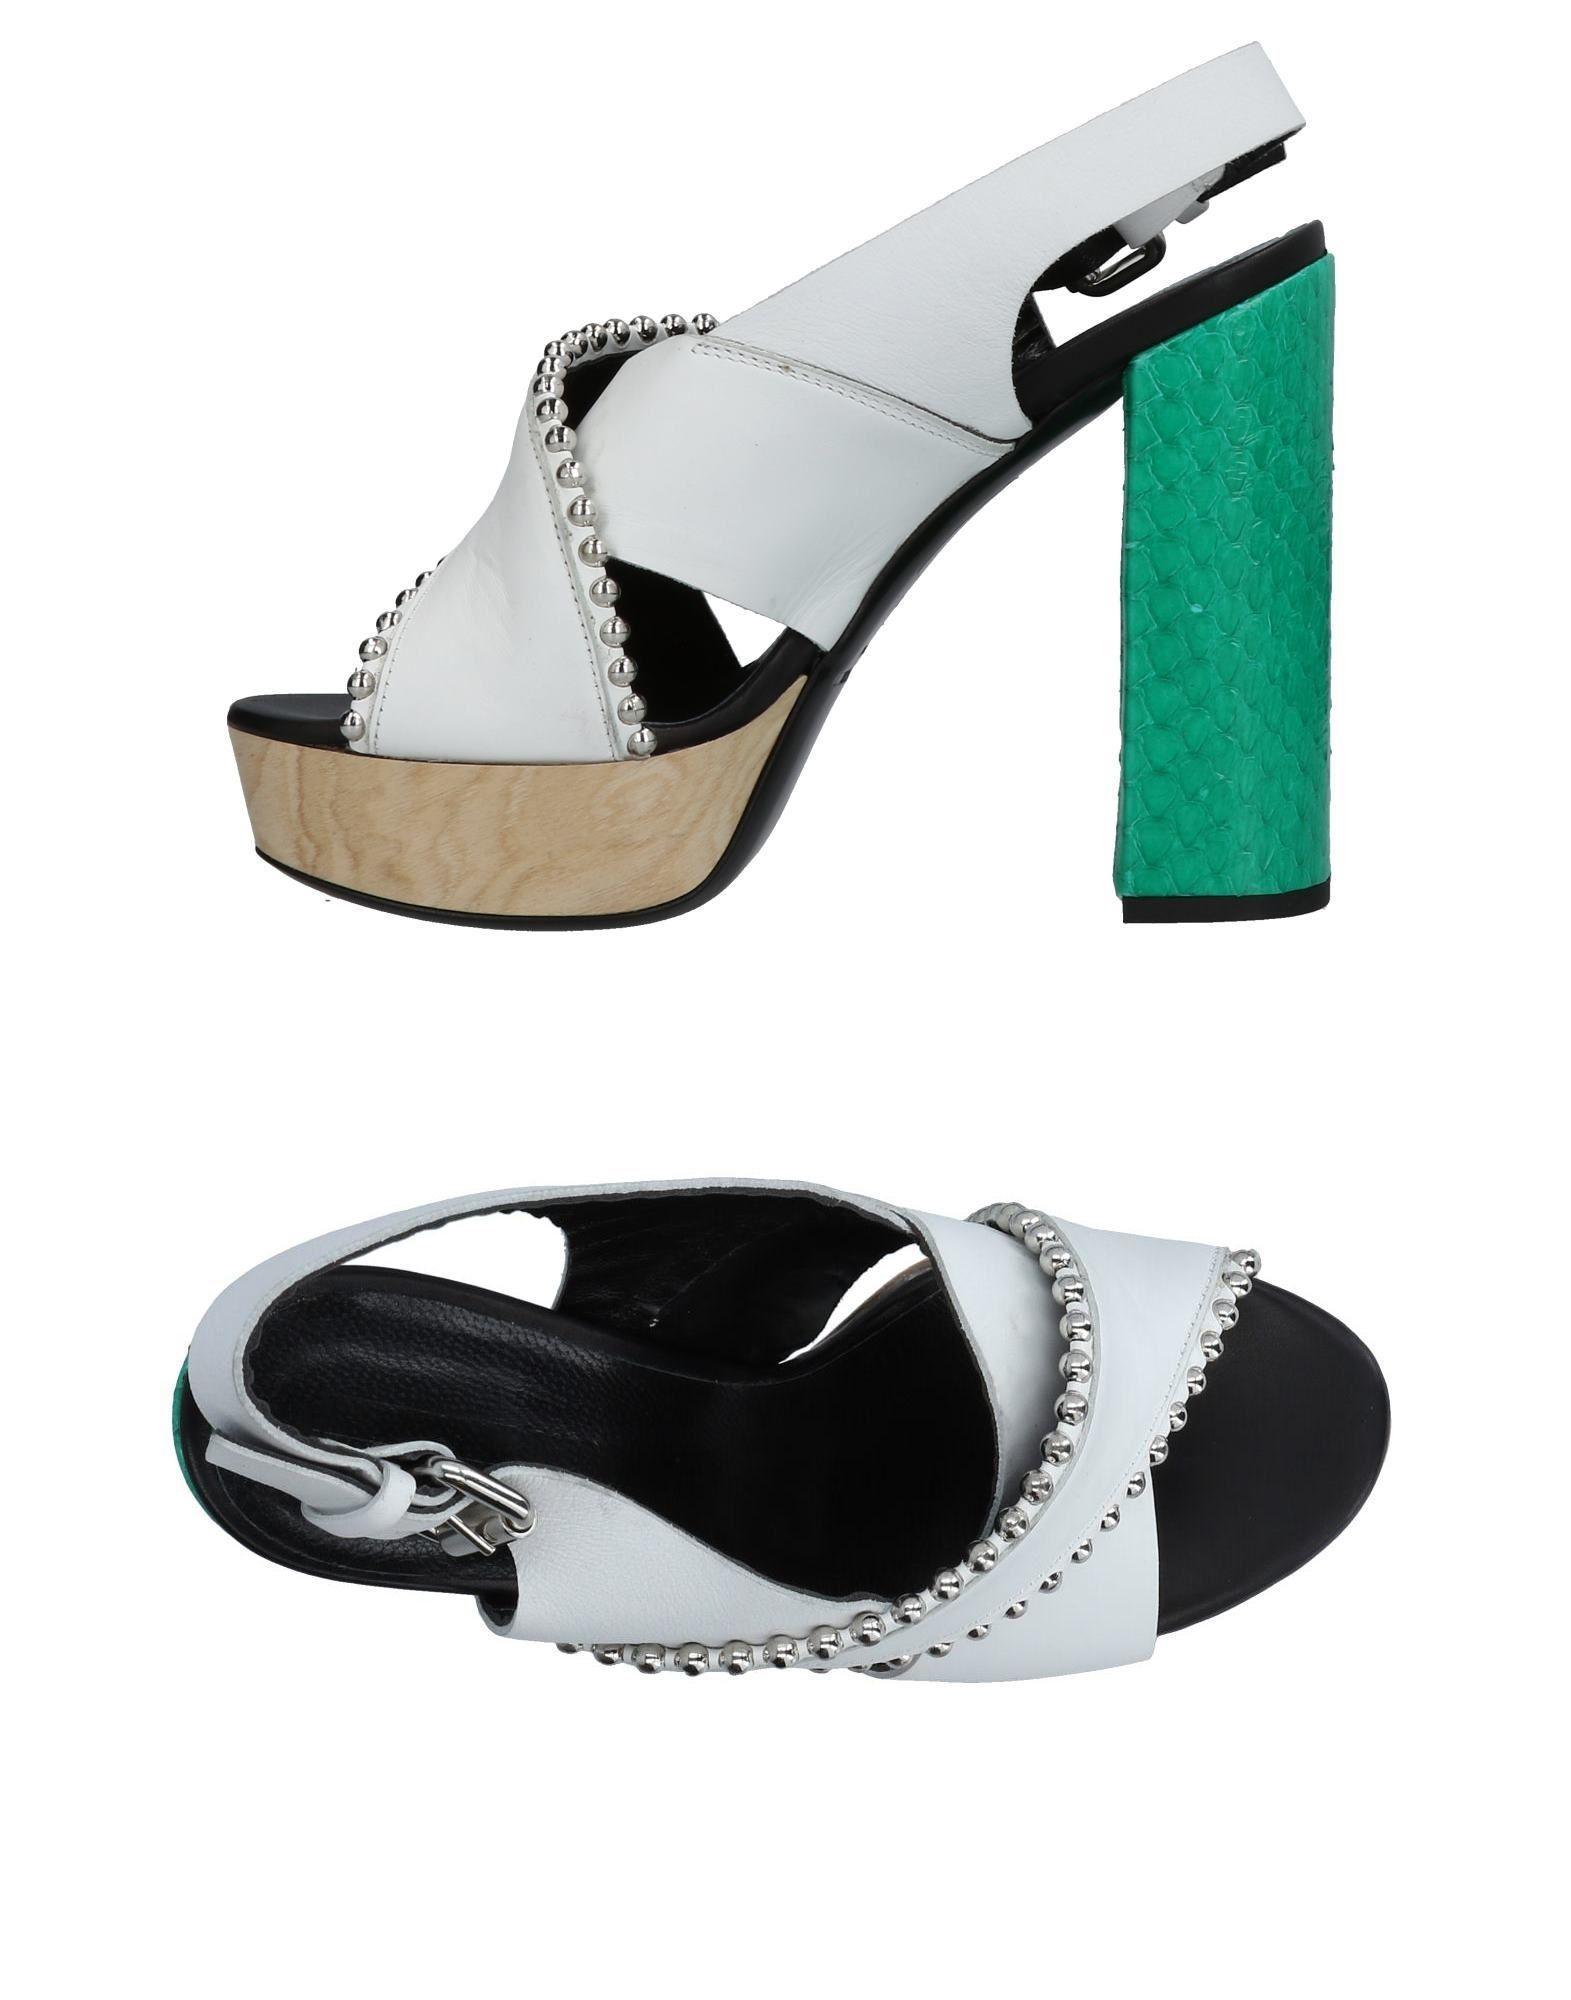 Mcq By Alexander Mcqueen Sandals In White